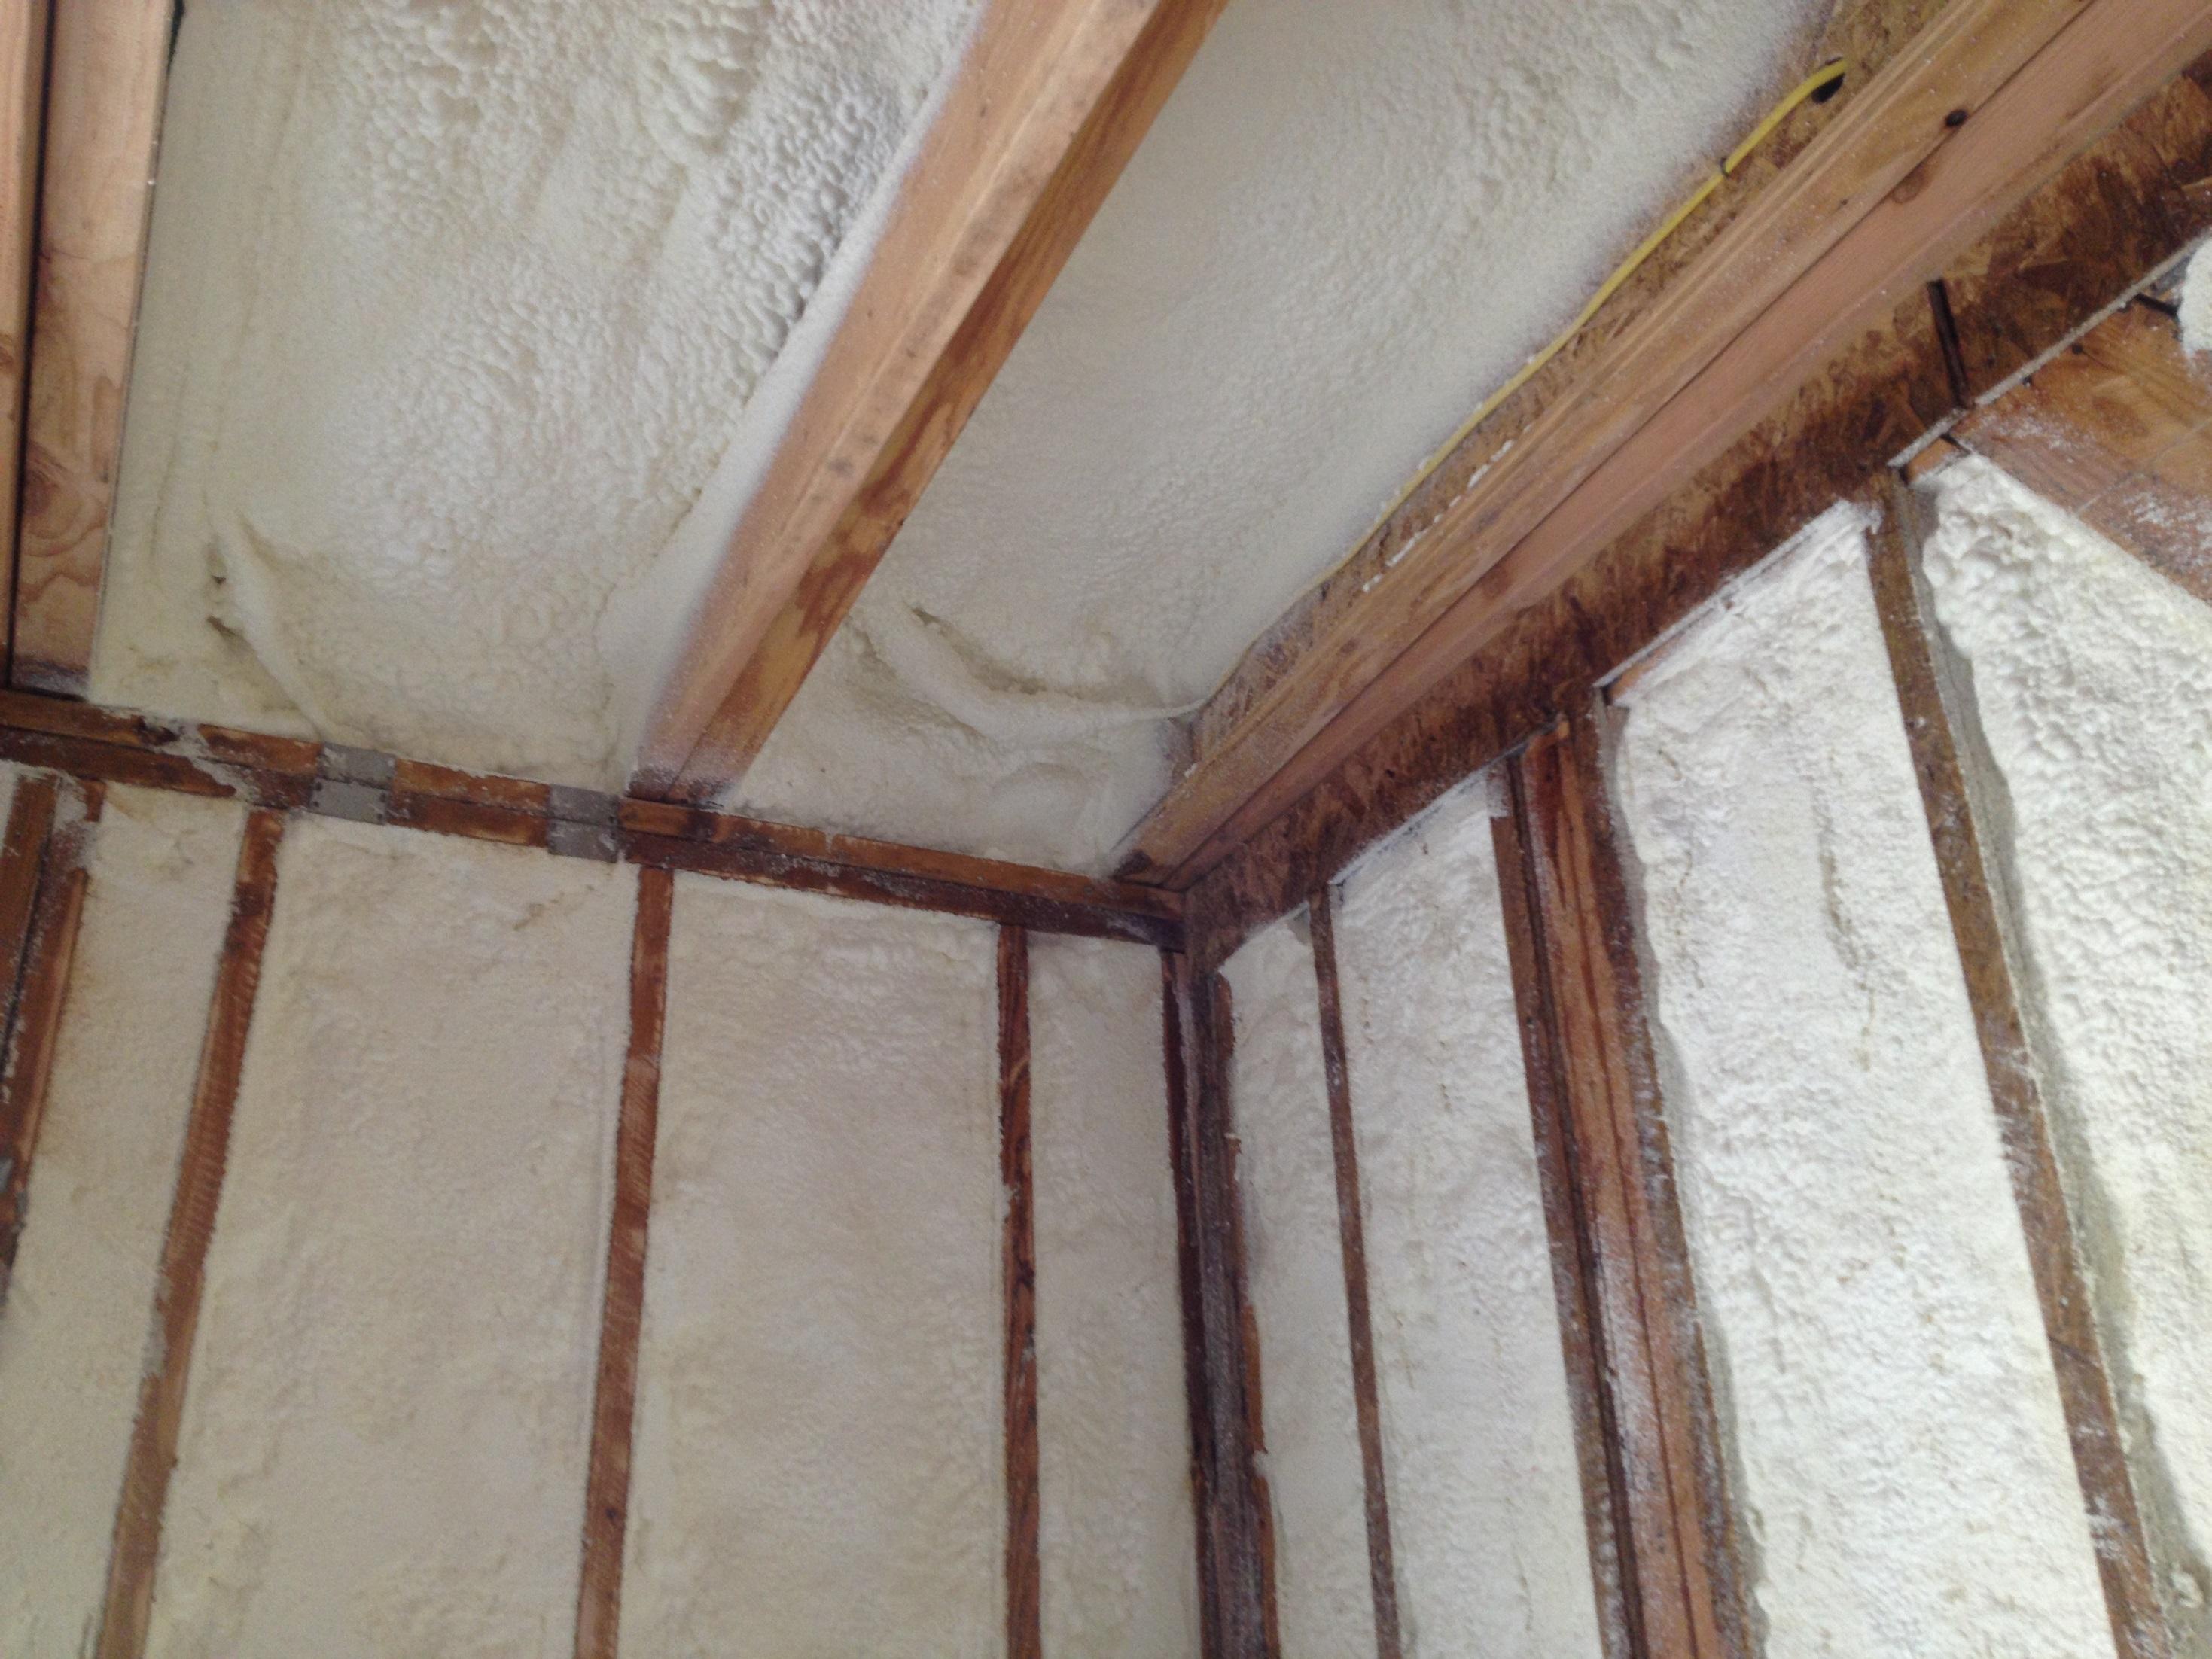 Spray Foam - Interior Spray Foam Insulation